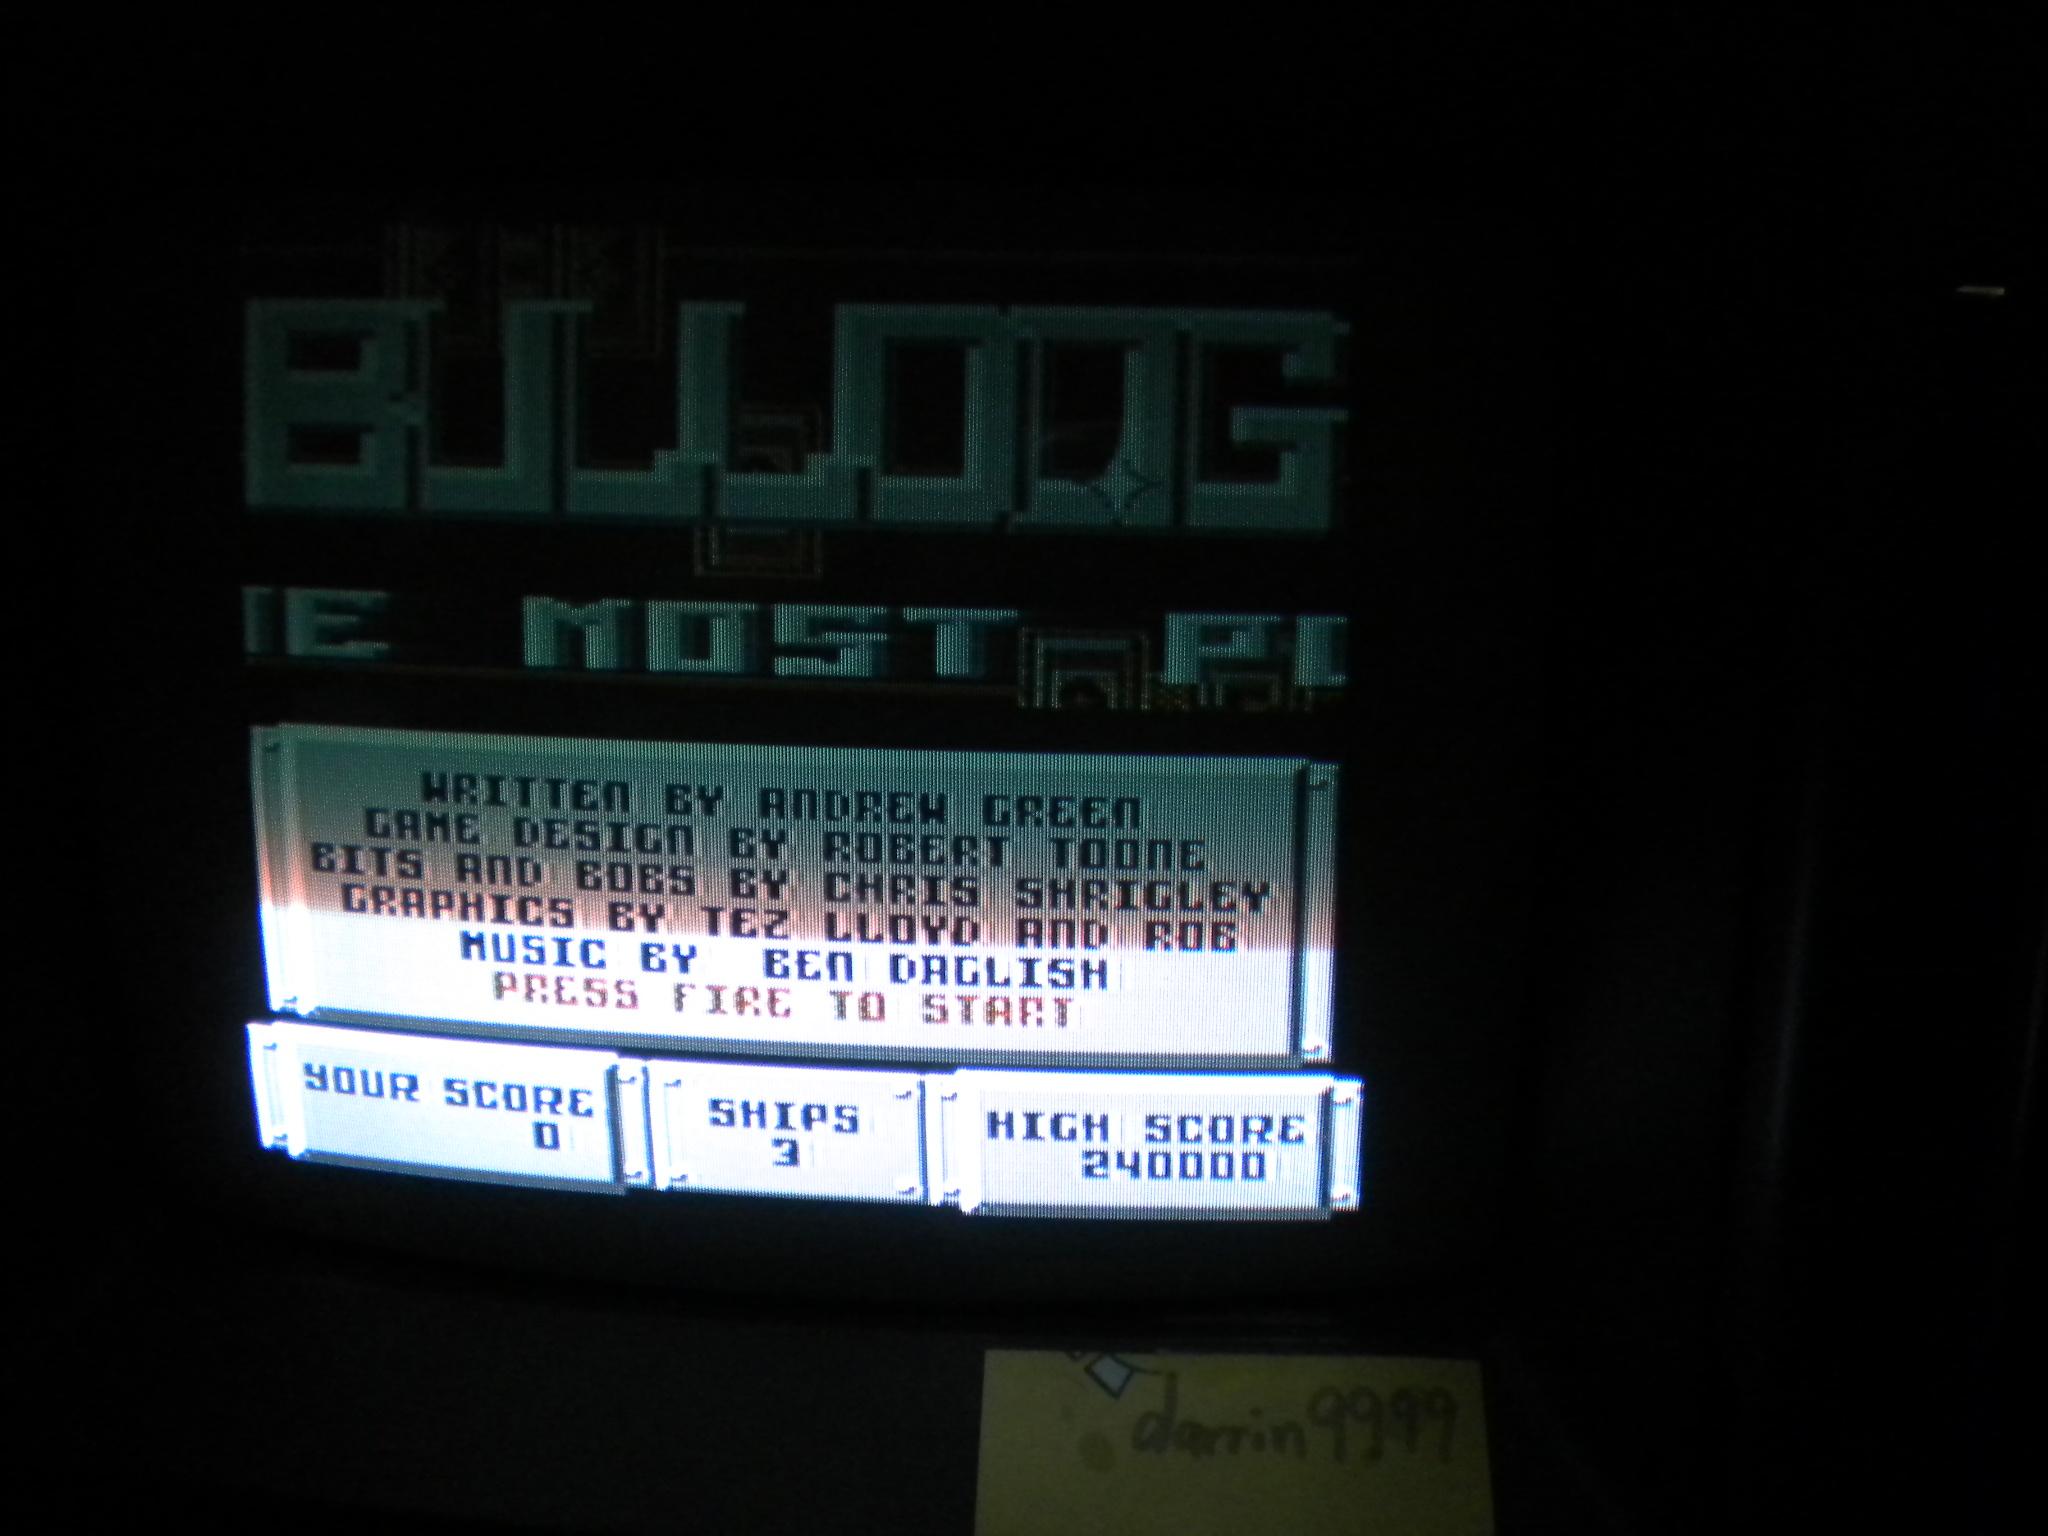 Bulldog 330,200 points